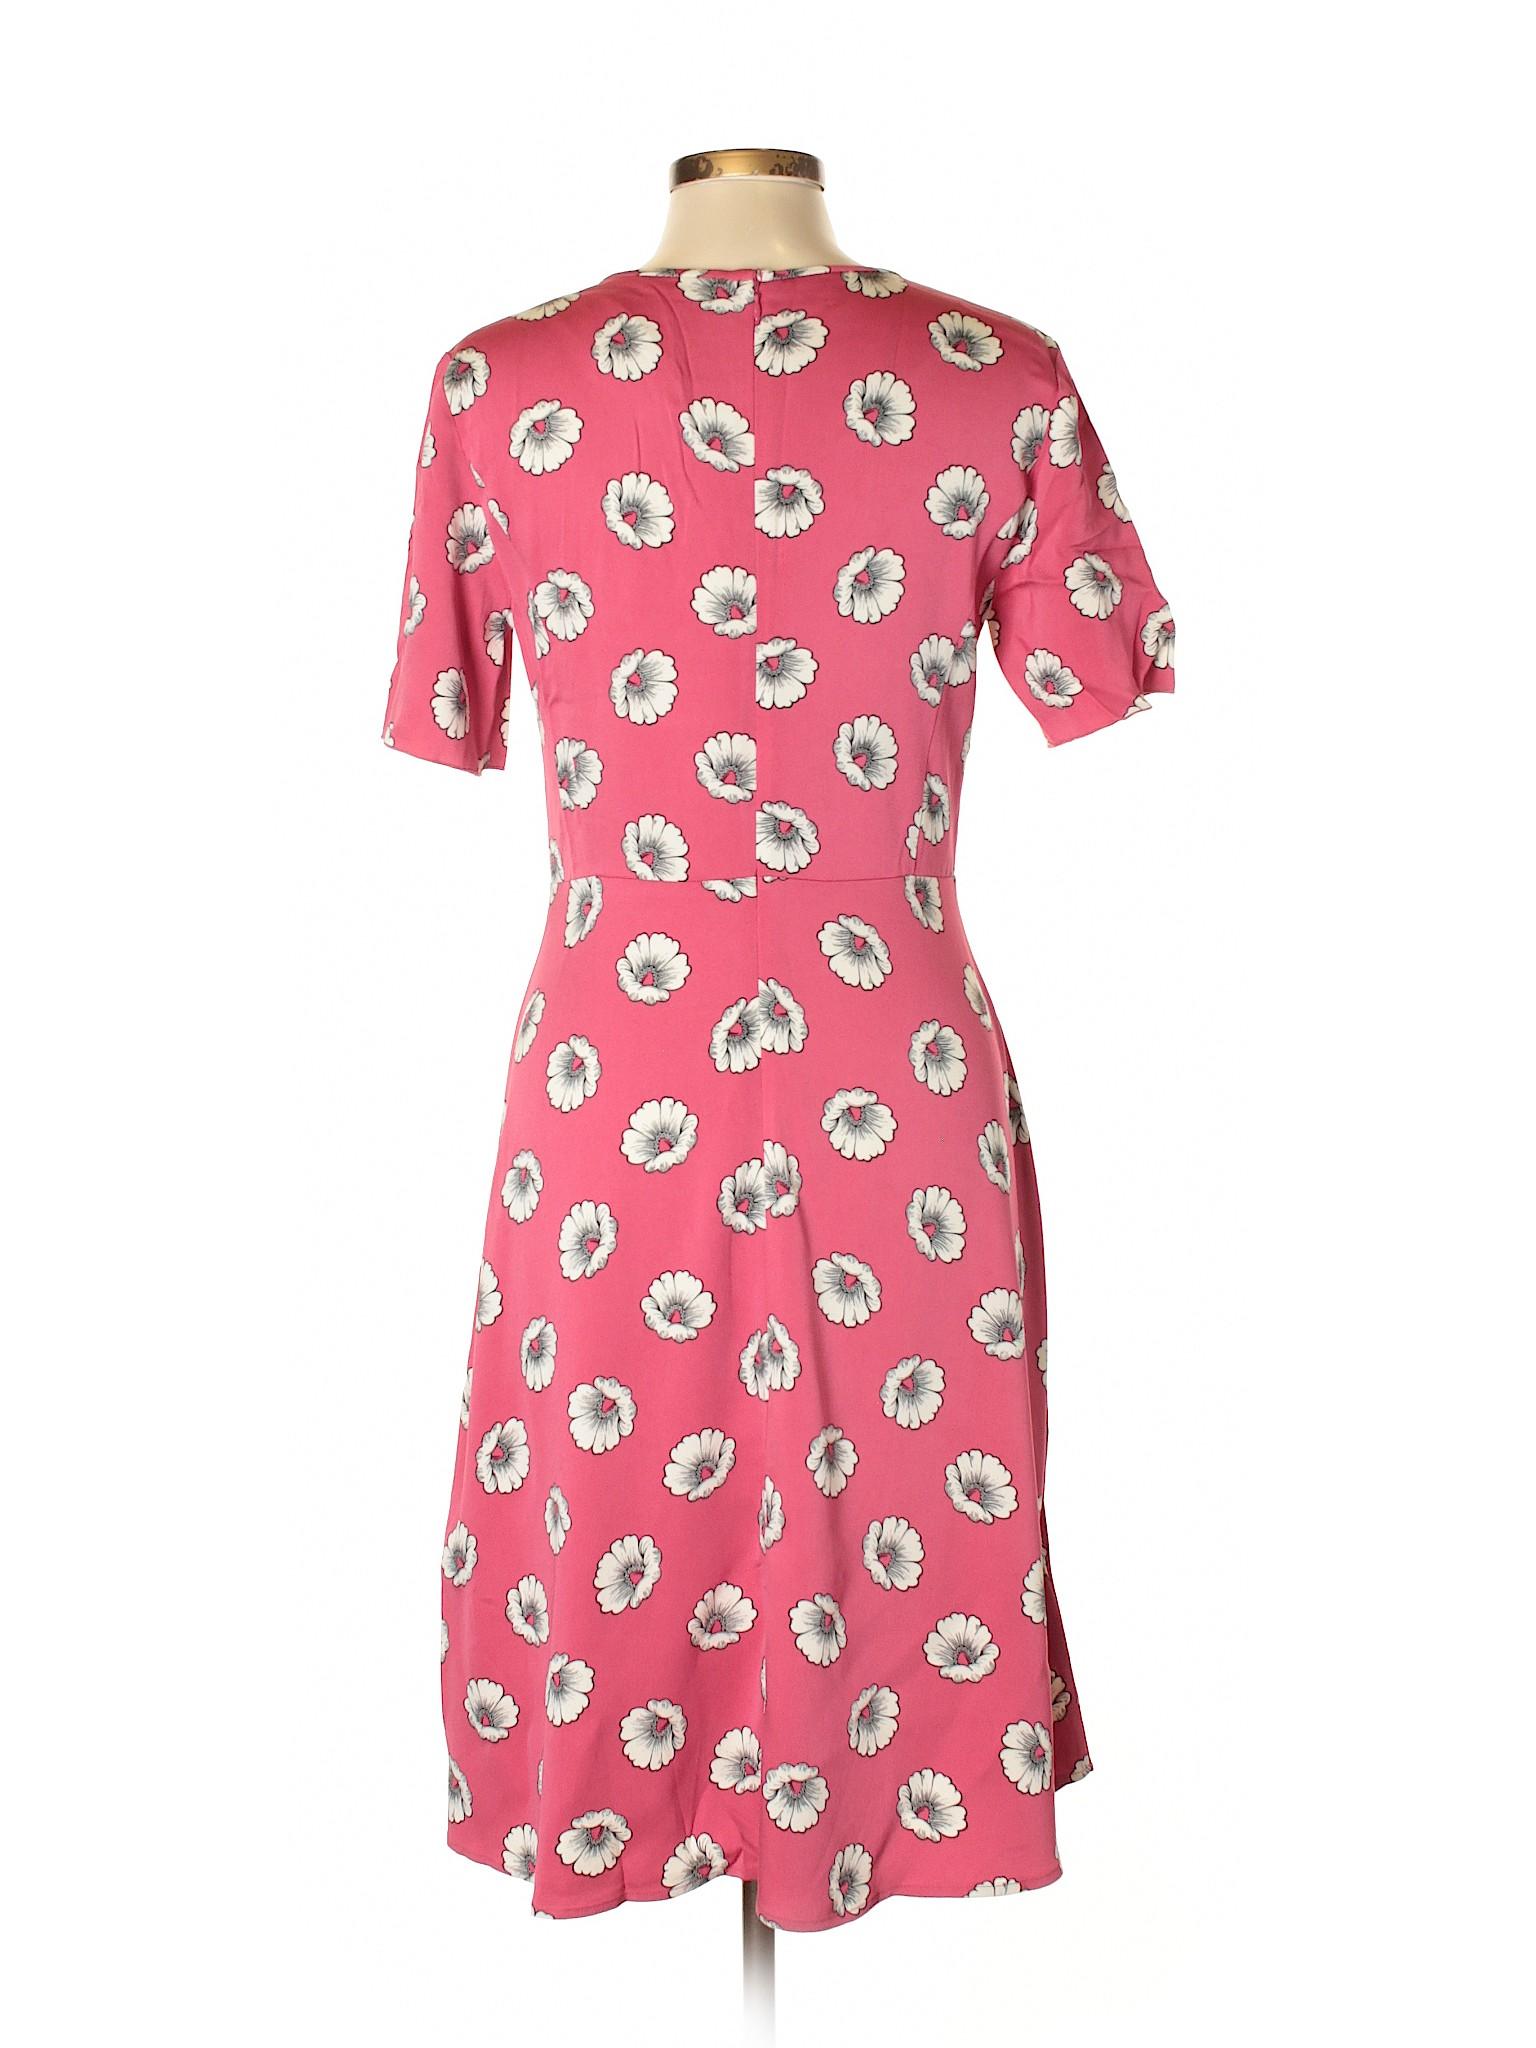 Taylor LOFT Dress Ann Selling Casual AFPHq